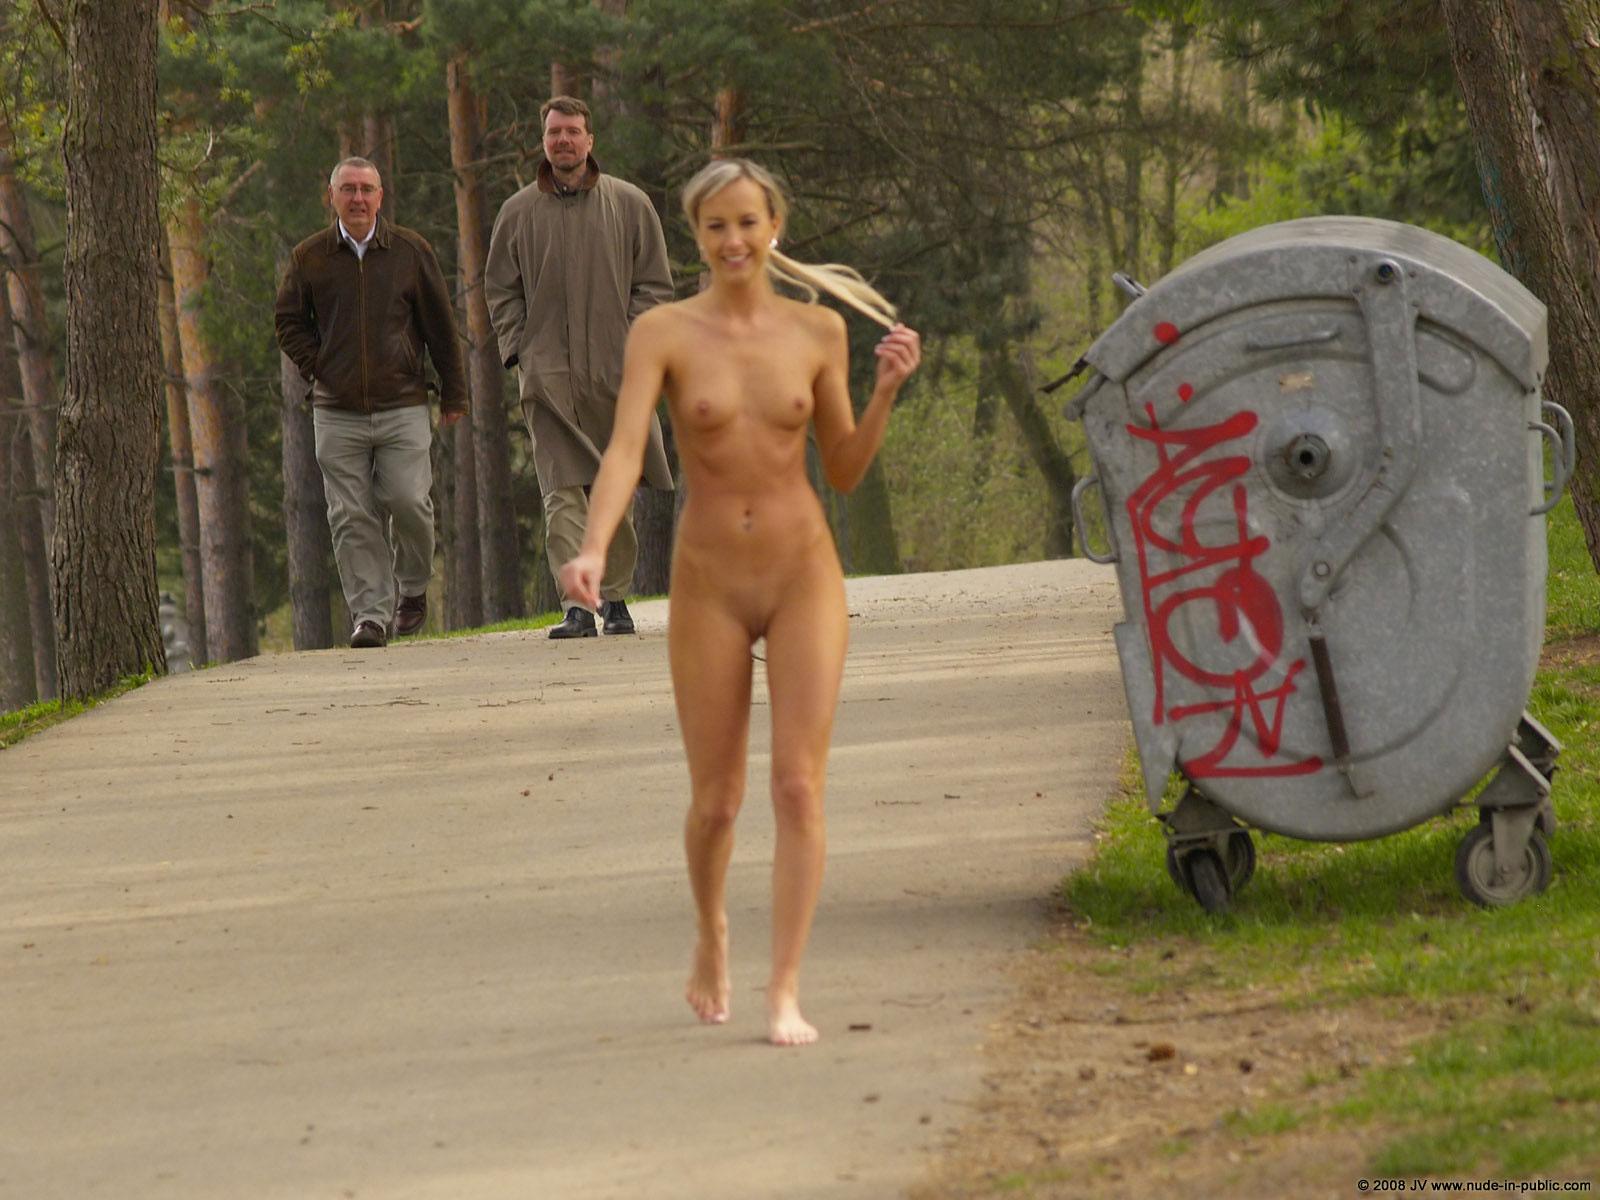 Australian featurethe naked wanderer, starring john cleese, begins its wa shoot